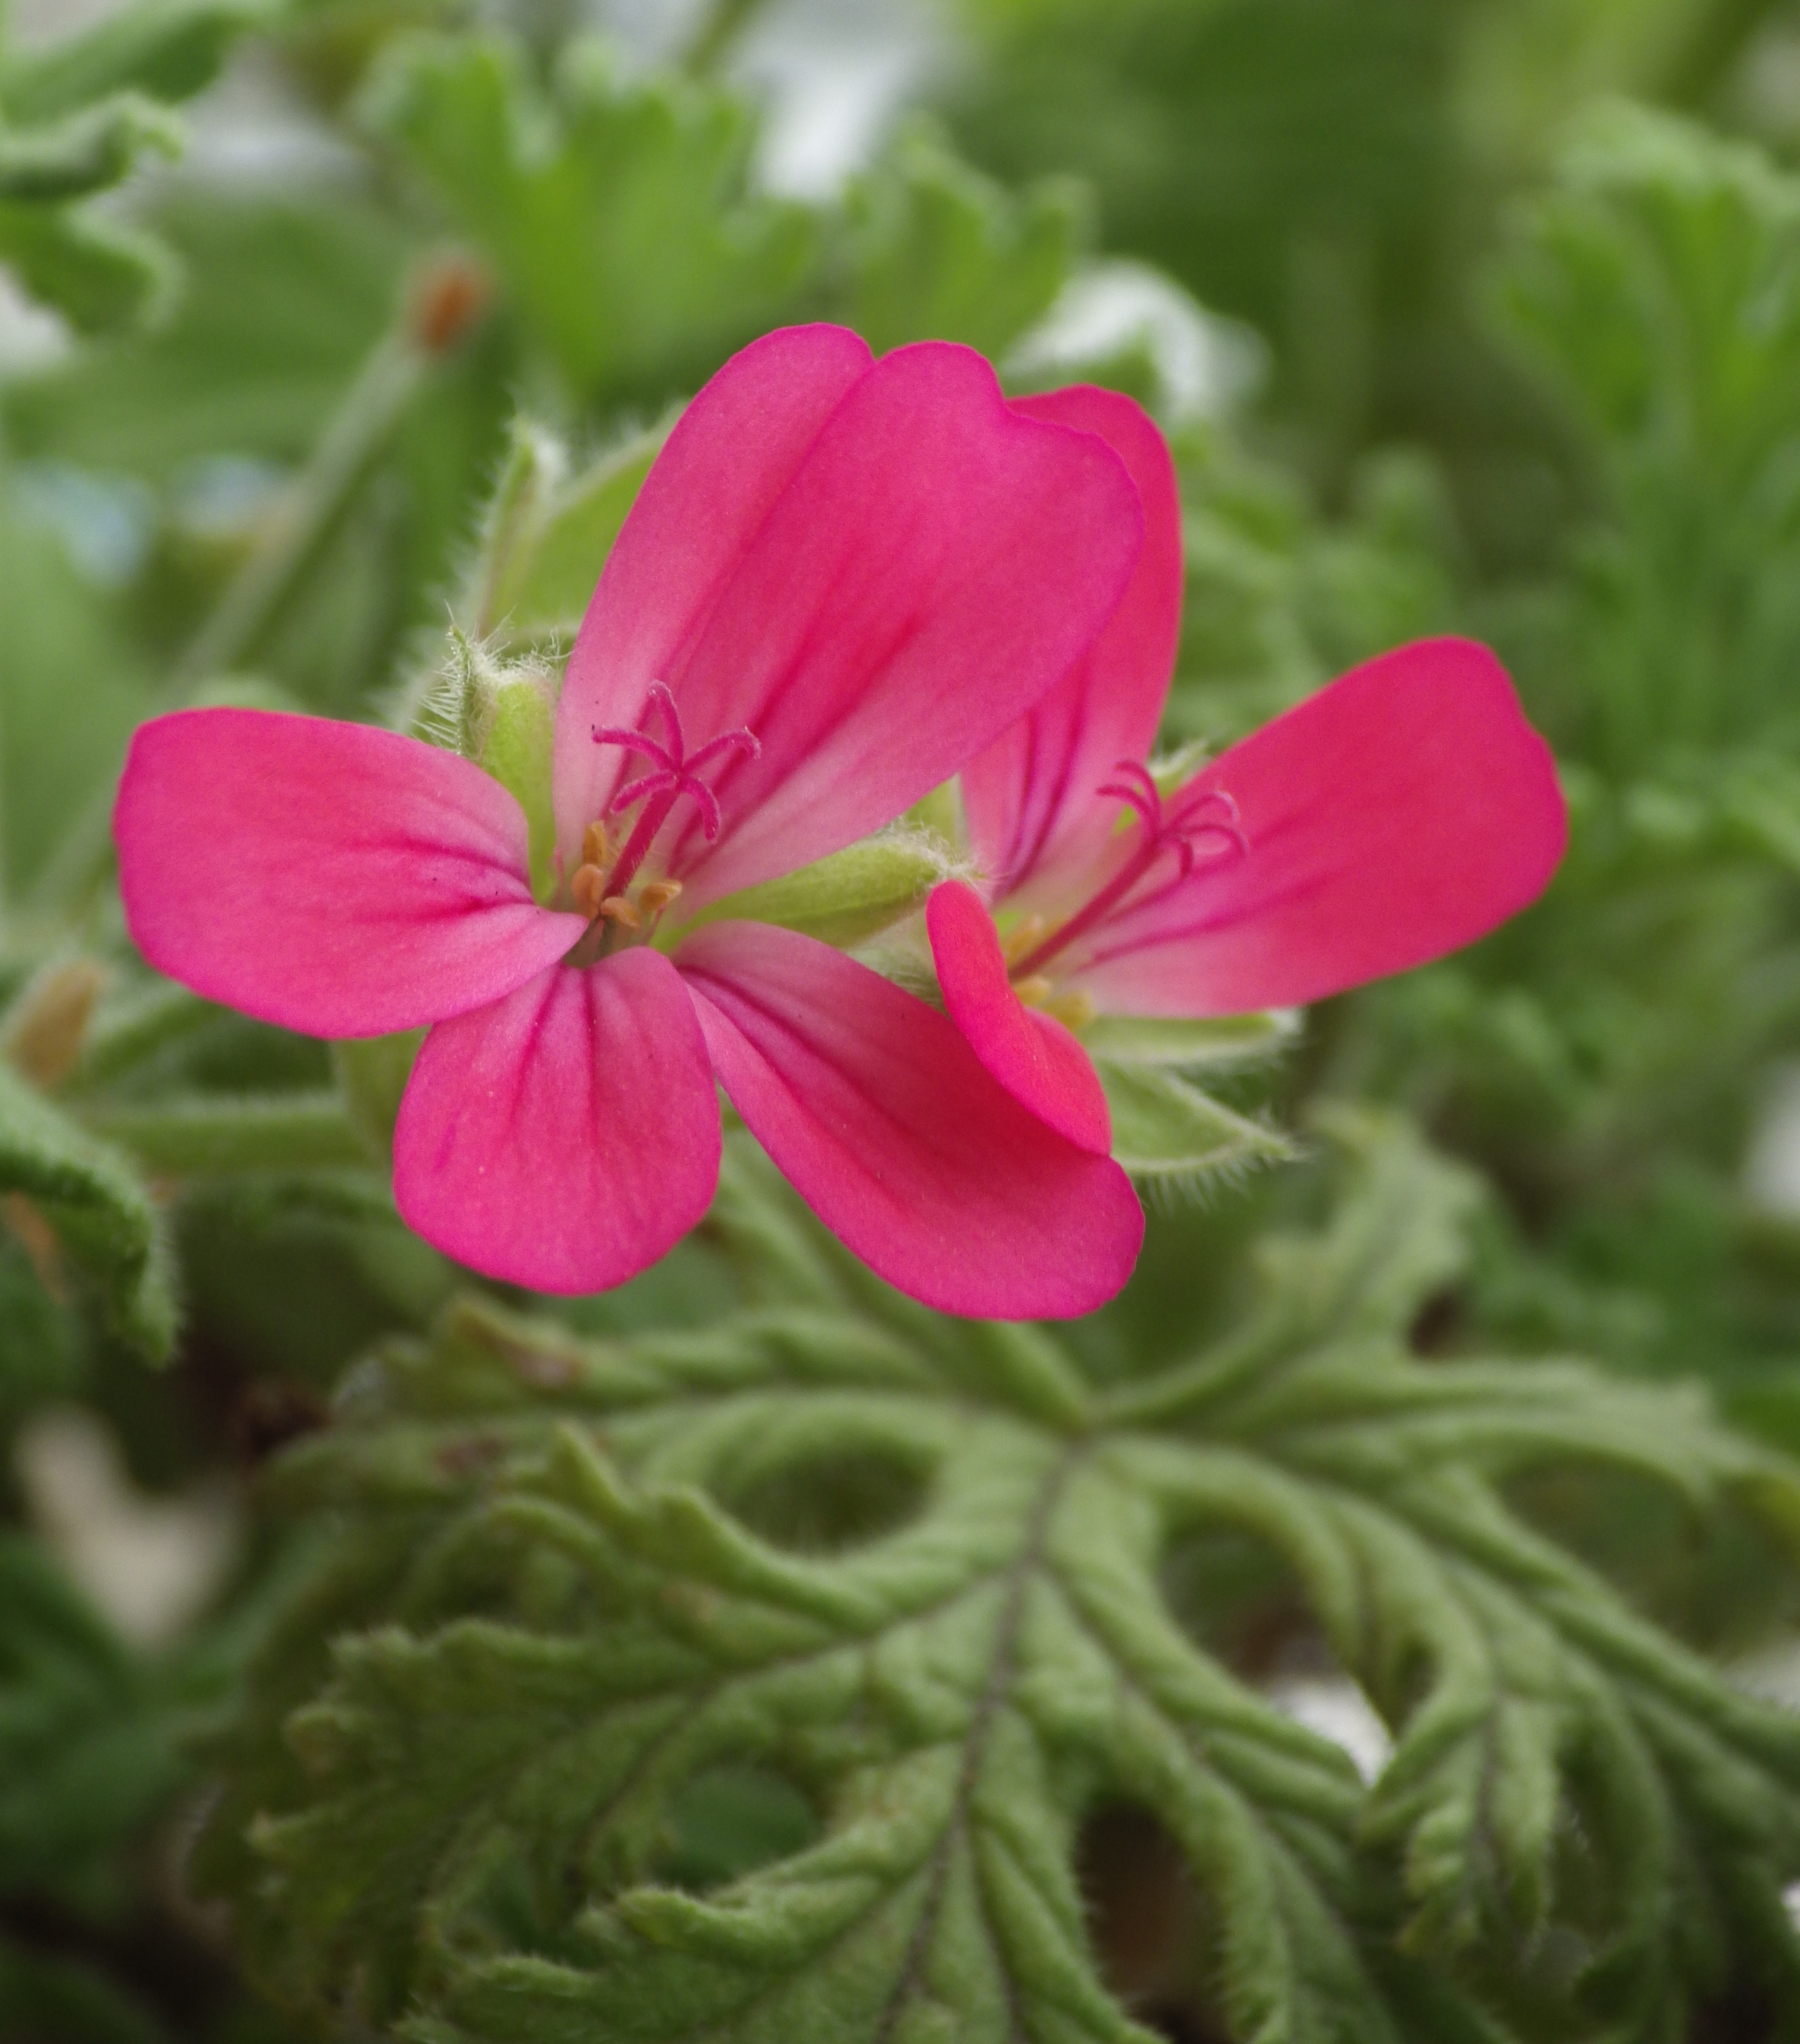 Geranium Red Flower